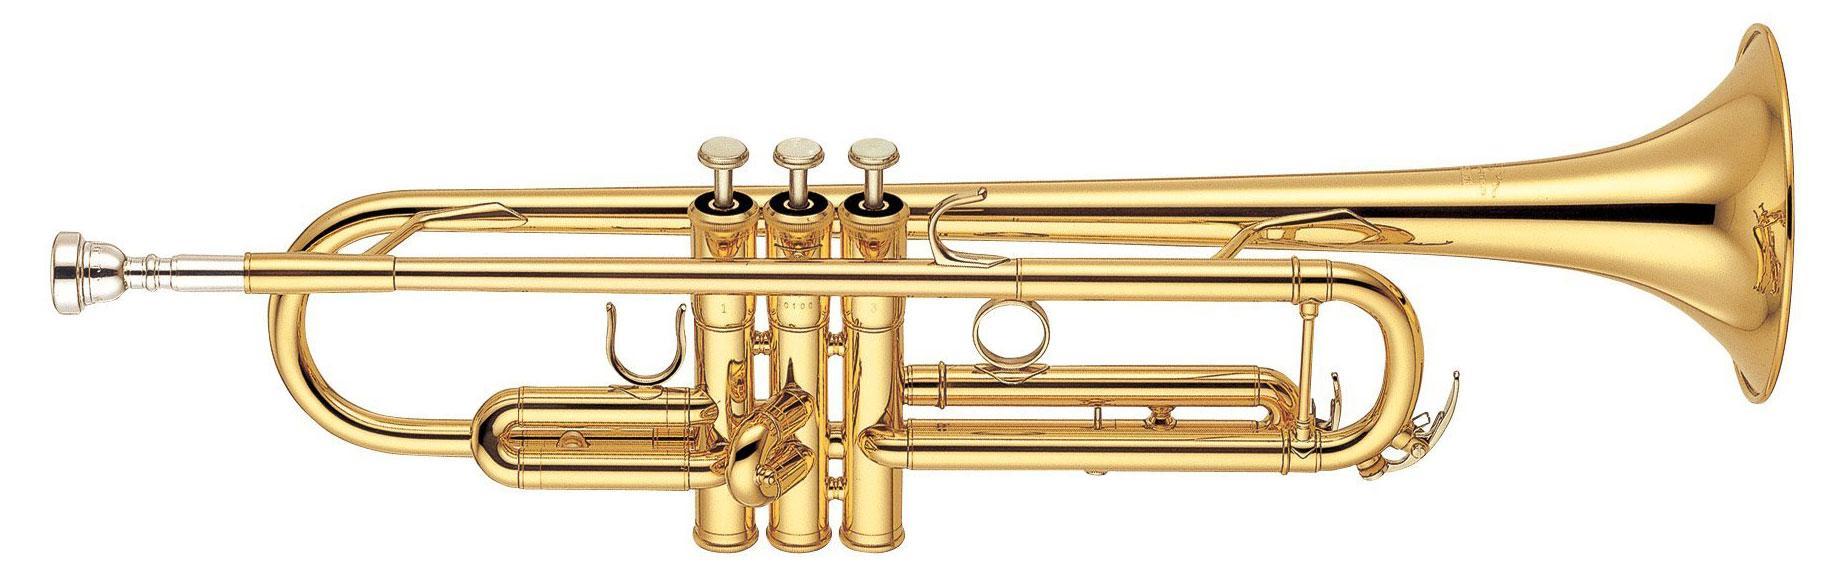 Yamaha Professional YTR 6335 Bb Trompete Goldlack